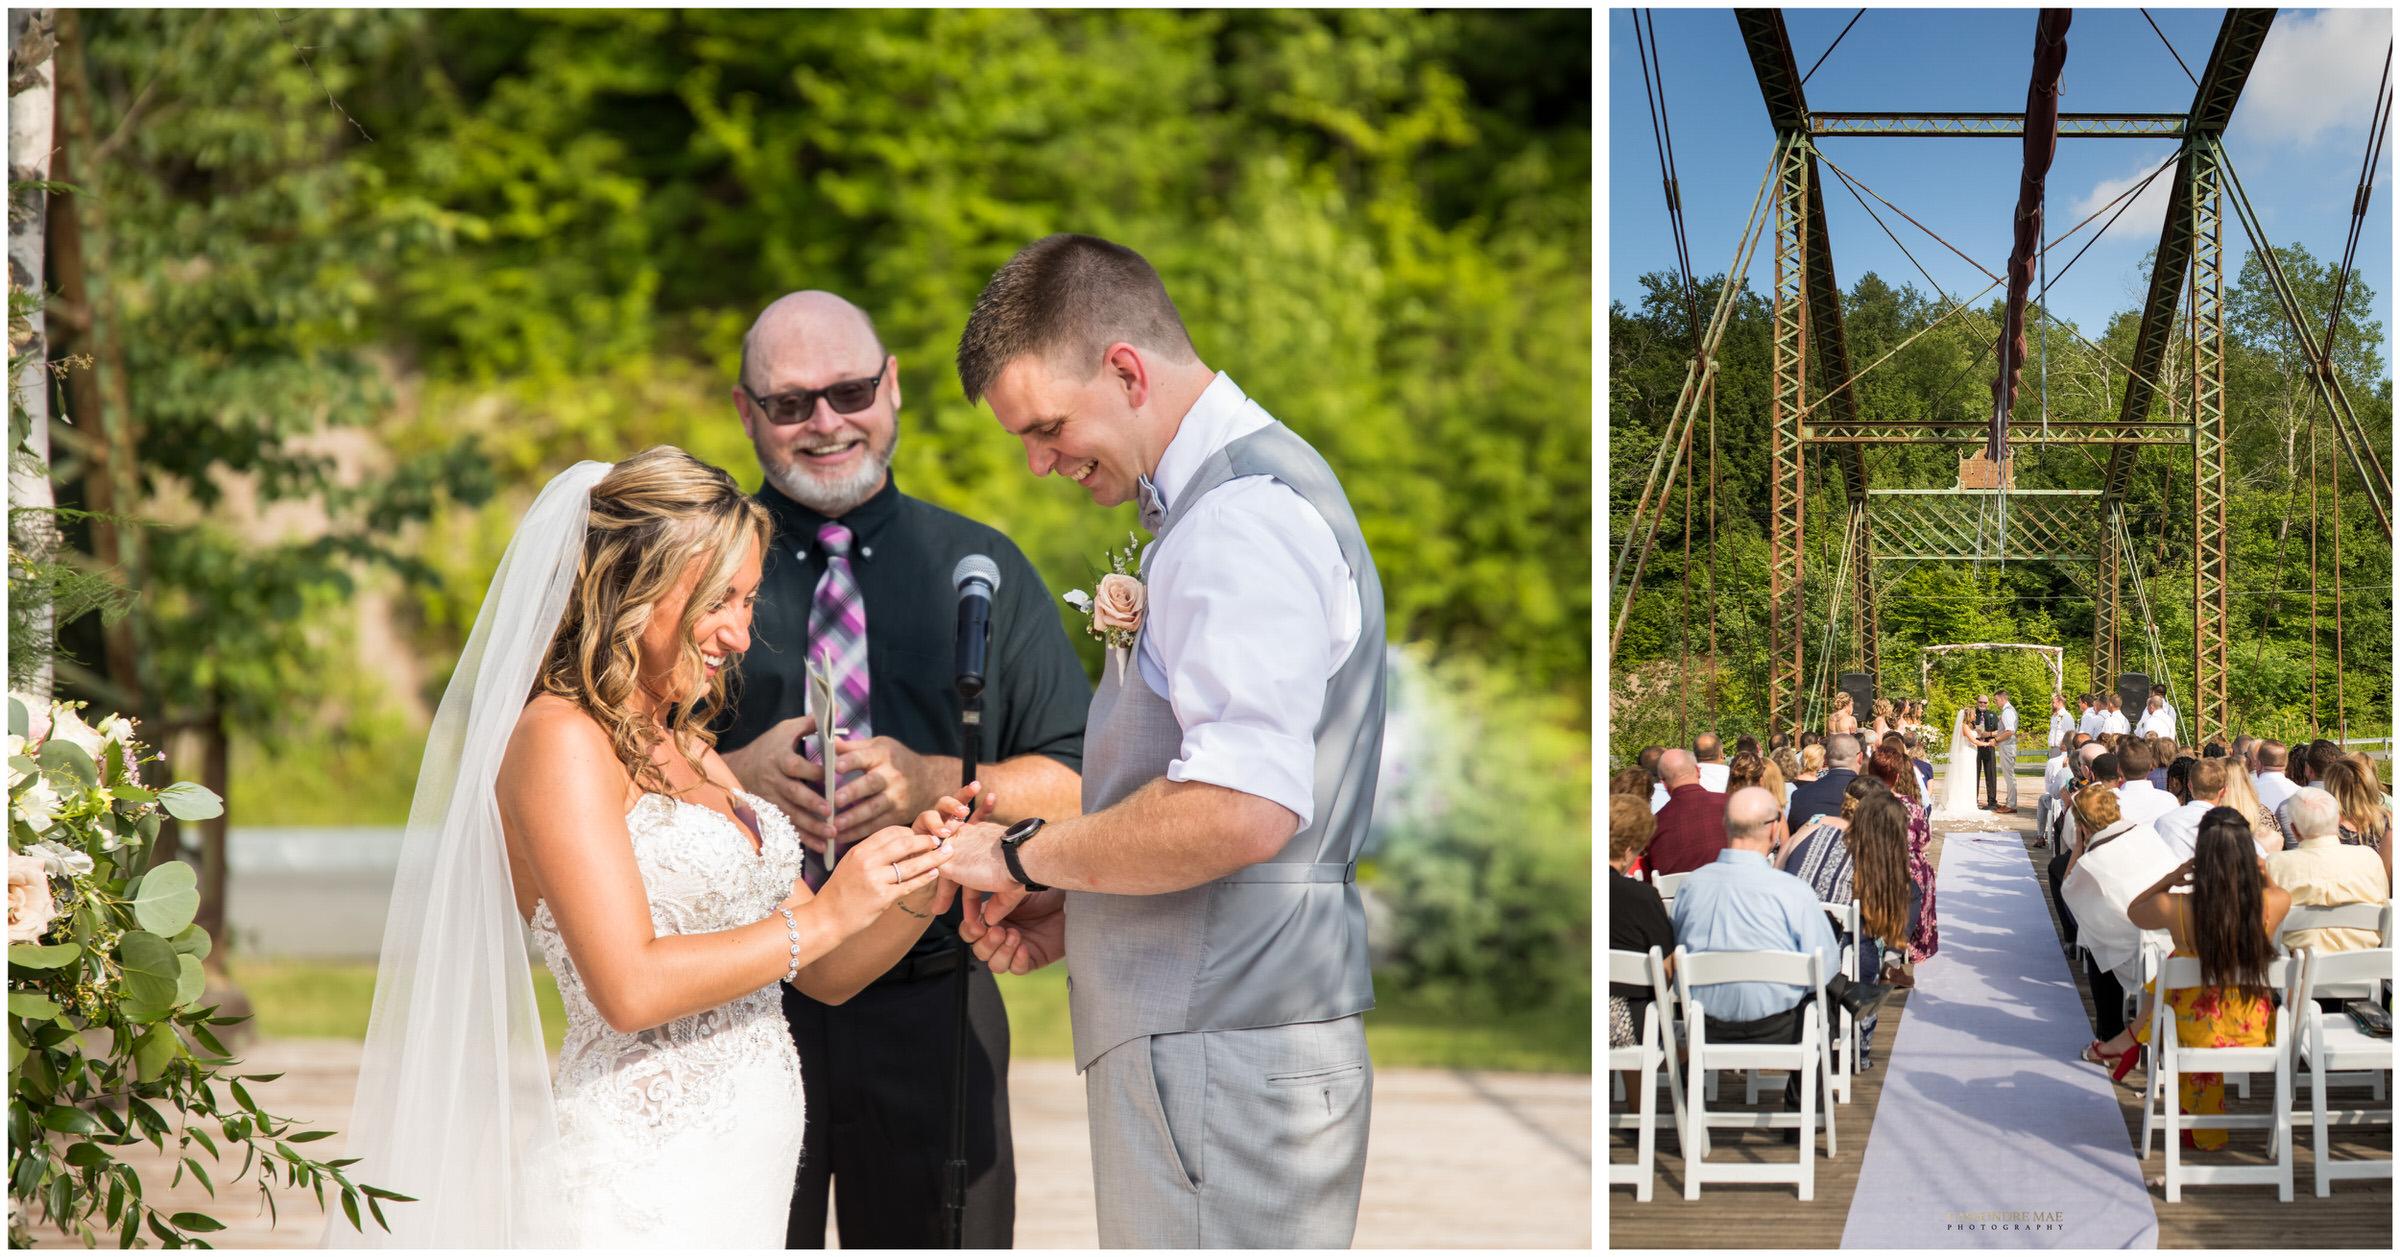 Cassondre Mae Photography Hudson Valley Wedding 16.jpg